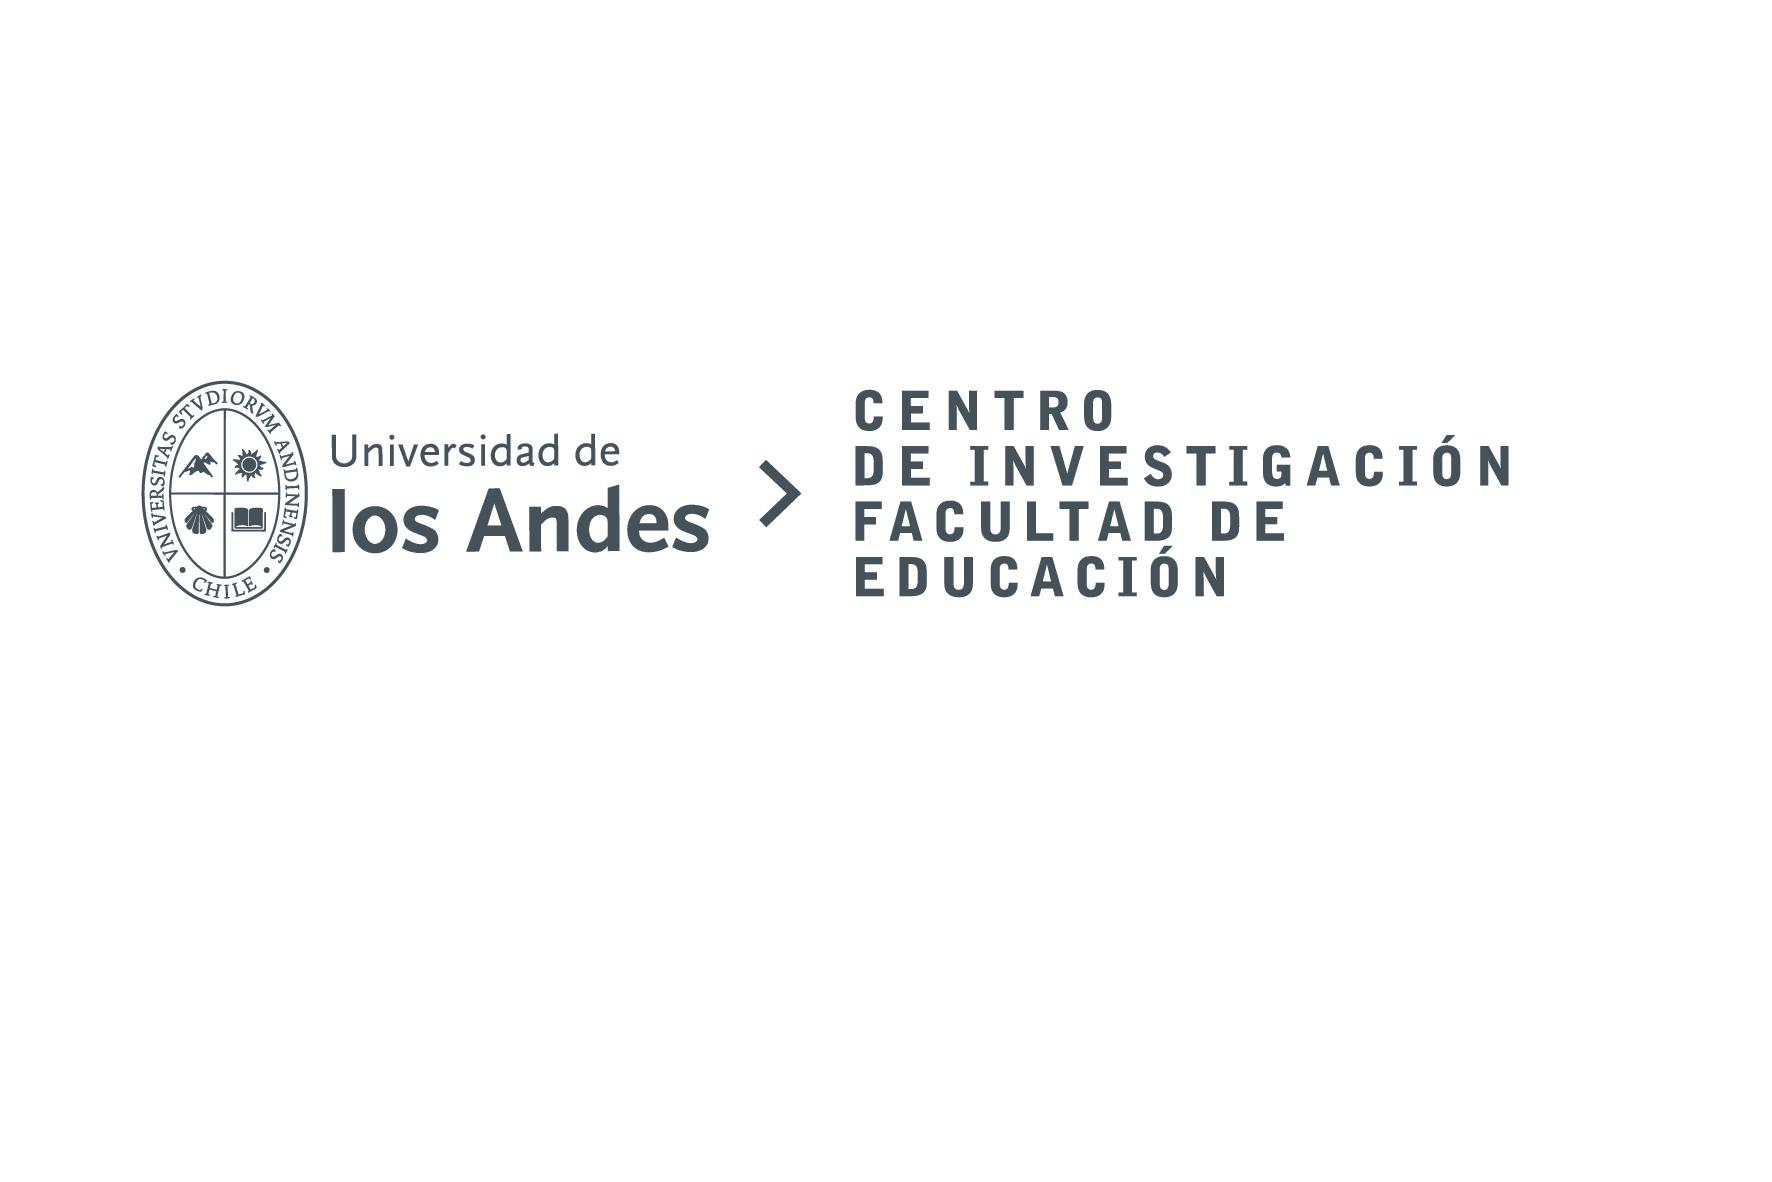 Centro de Investigación en Educación